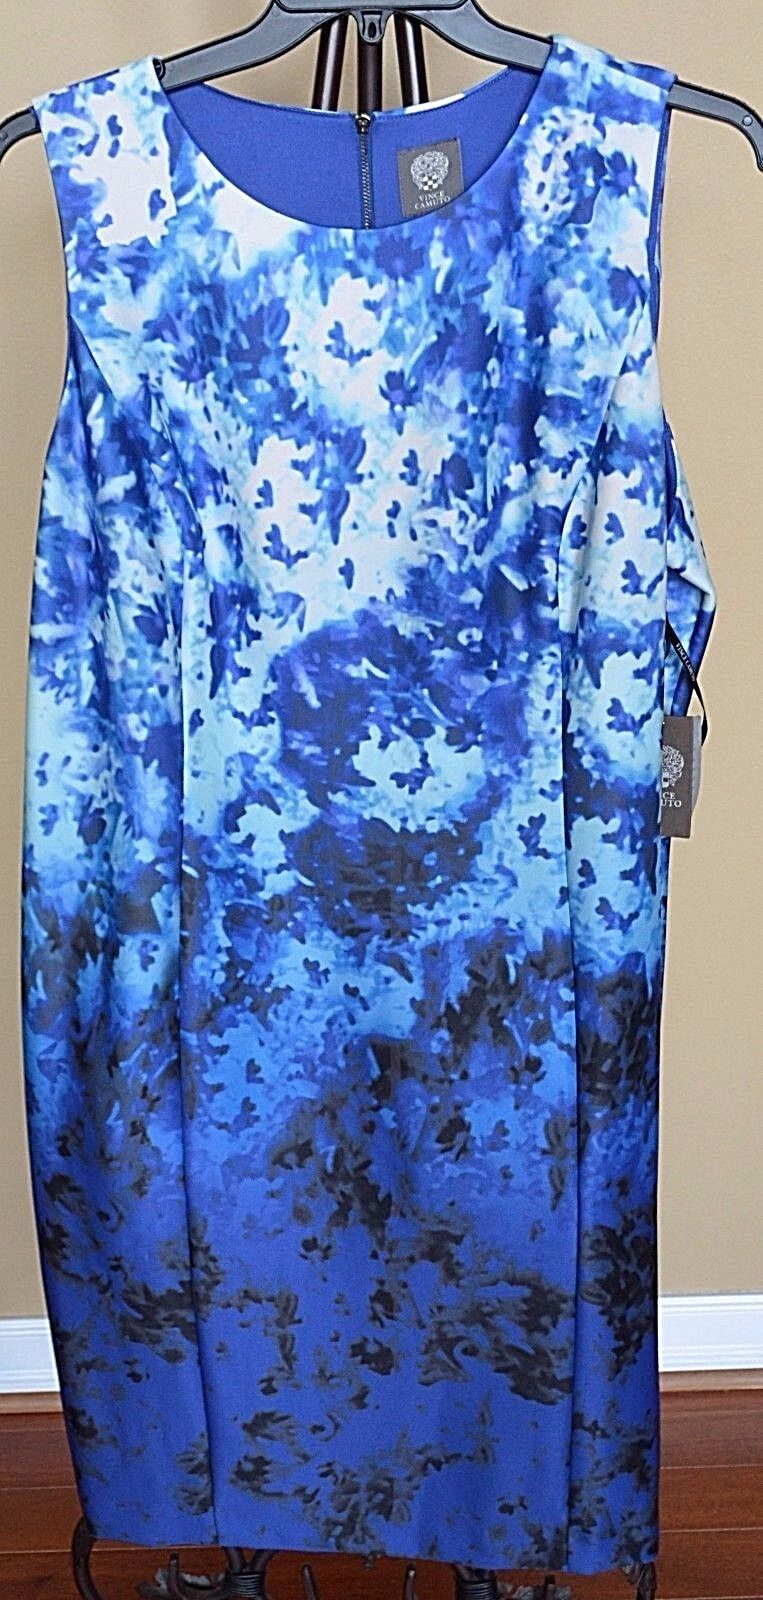 Vince Camuto Gradual Blaus Sheath Dress Sz.18W NWT